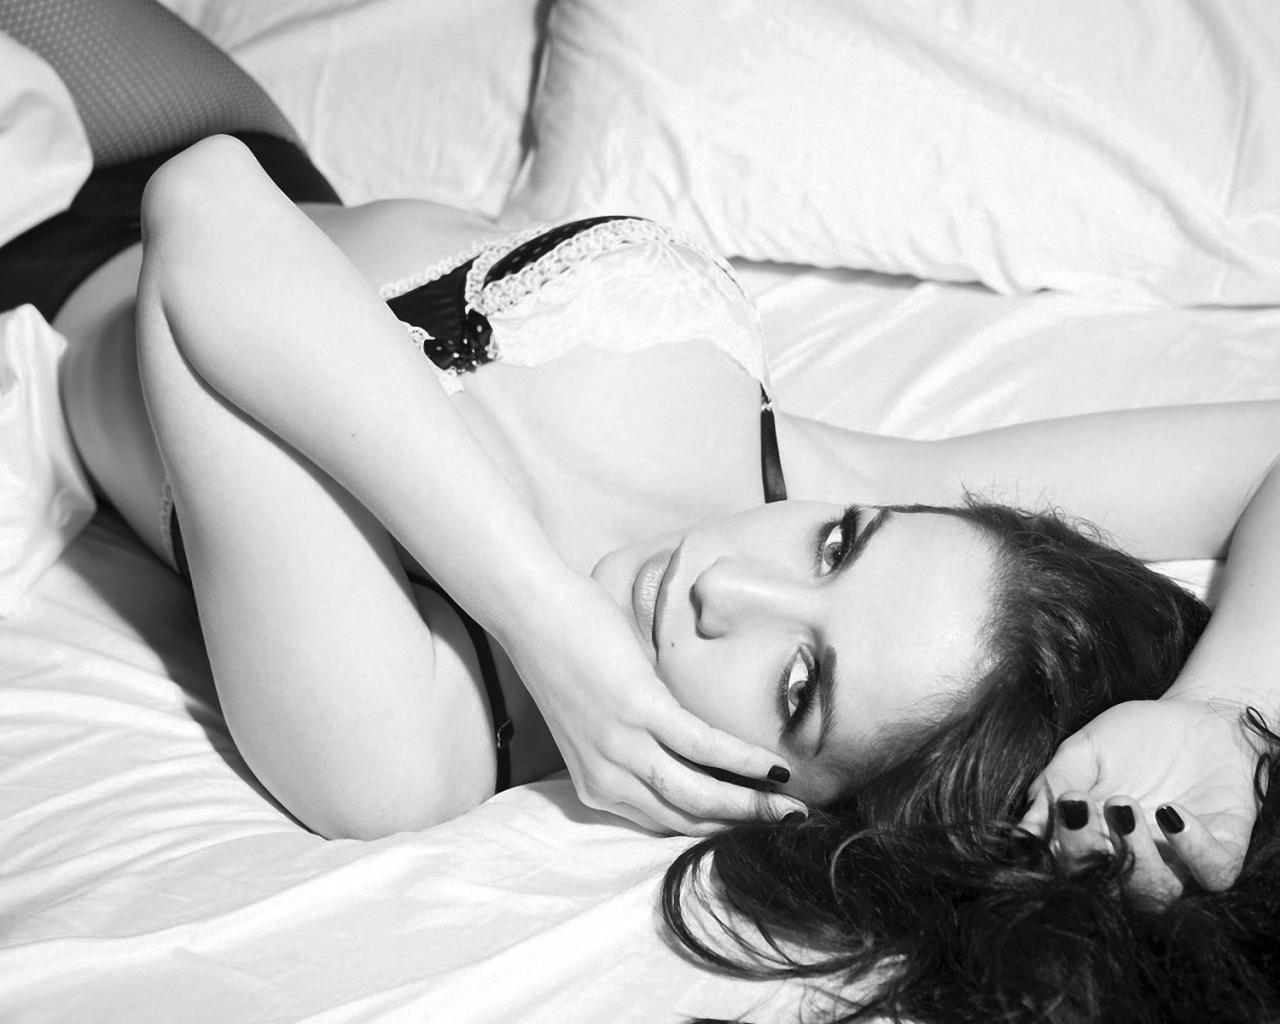 Чёрно белые картинки девушек брюнеток 9 фотография